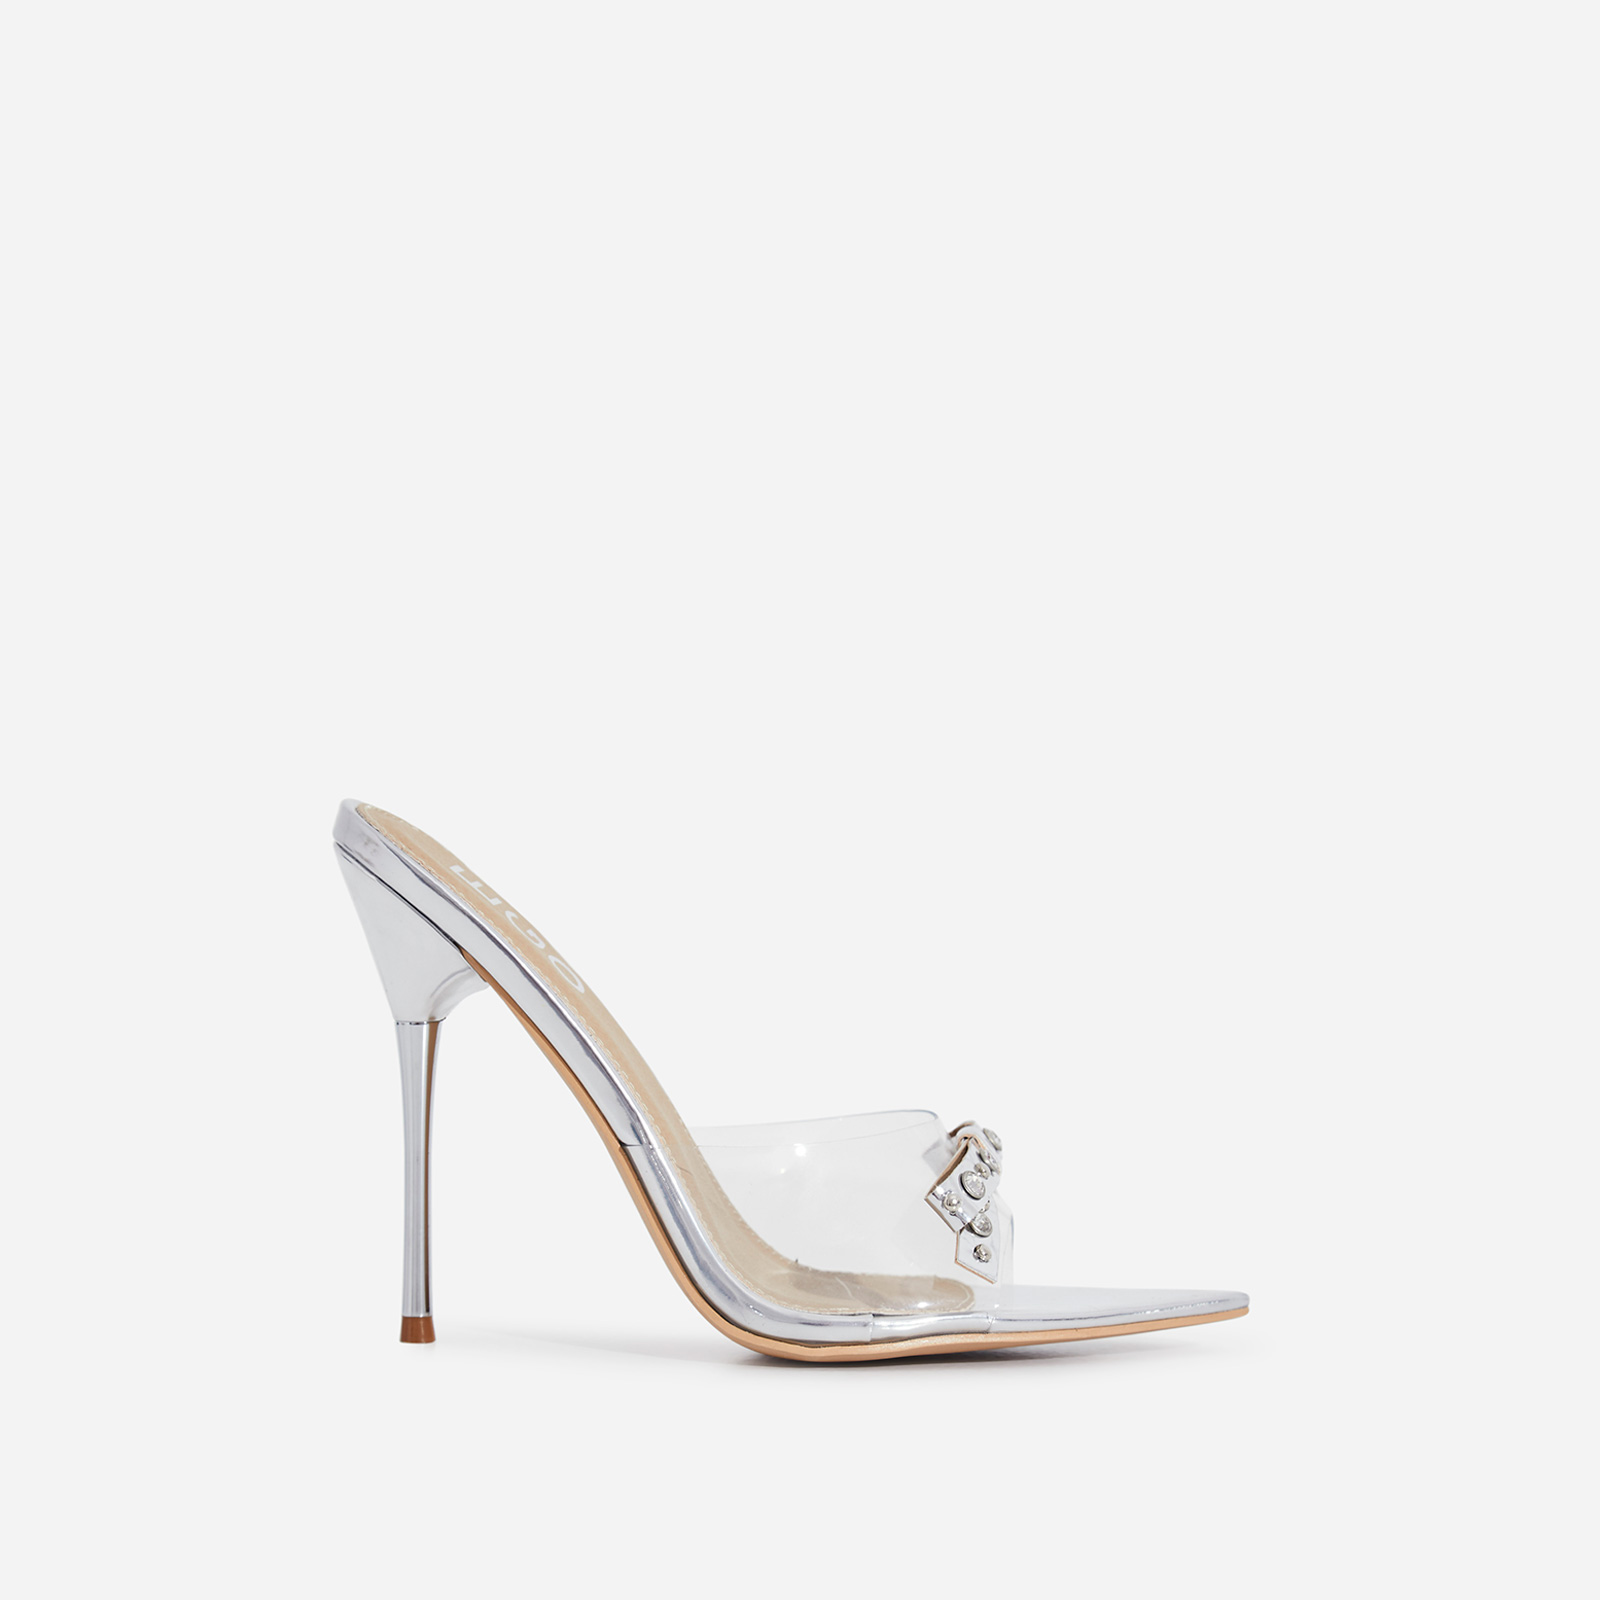 Gabb Studded Bow Detail Perspex Peep Toe Heel Mule In Silver Patent